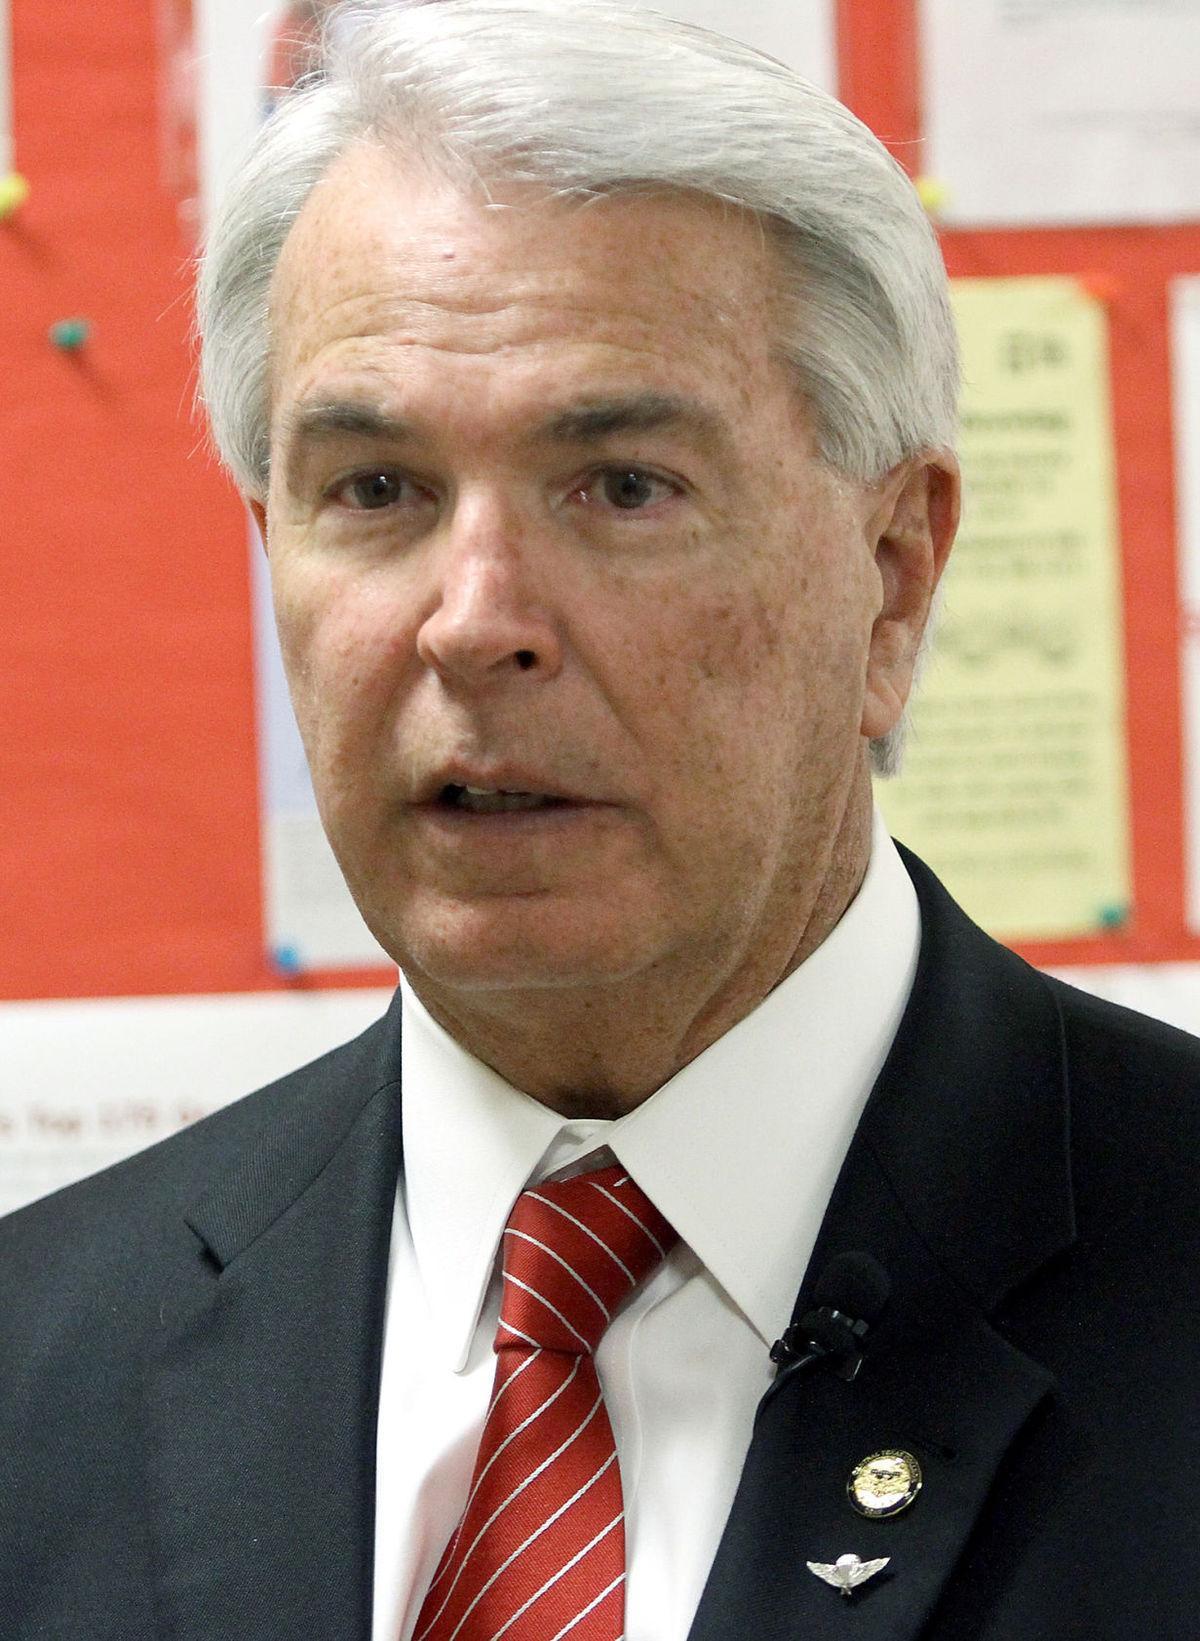 Jim Yeonopolus, chancellor of Central Texas College